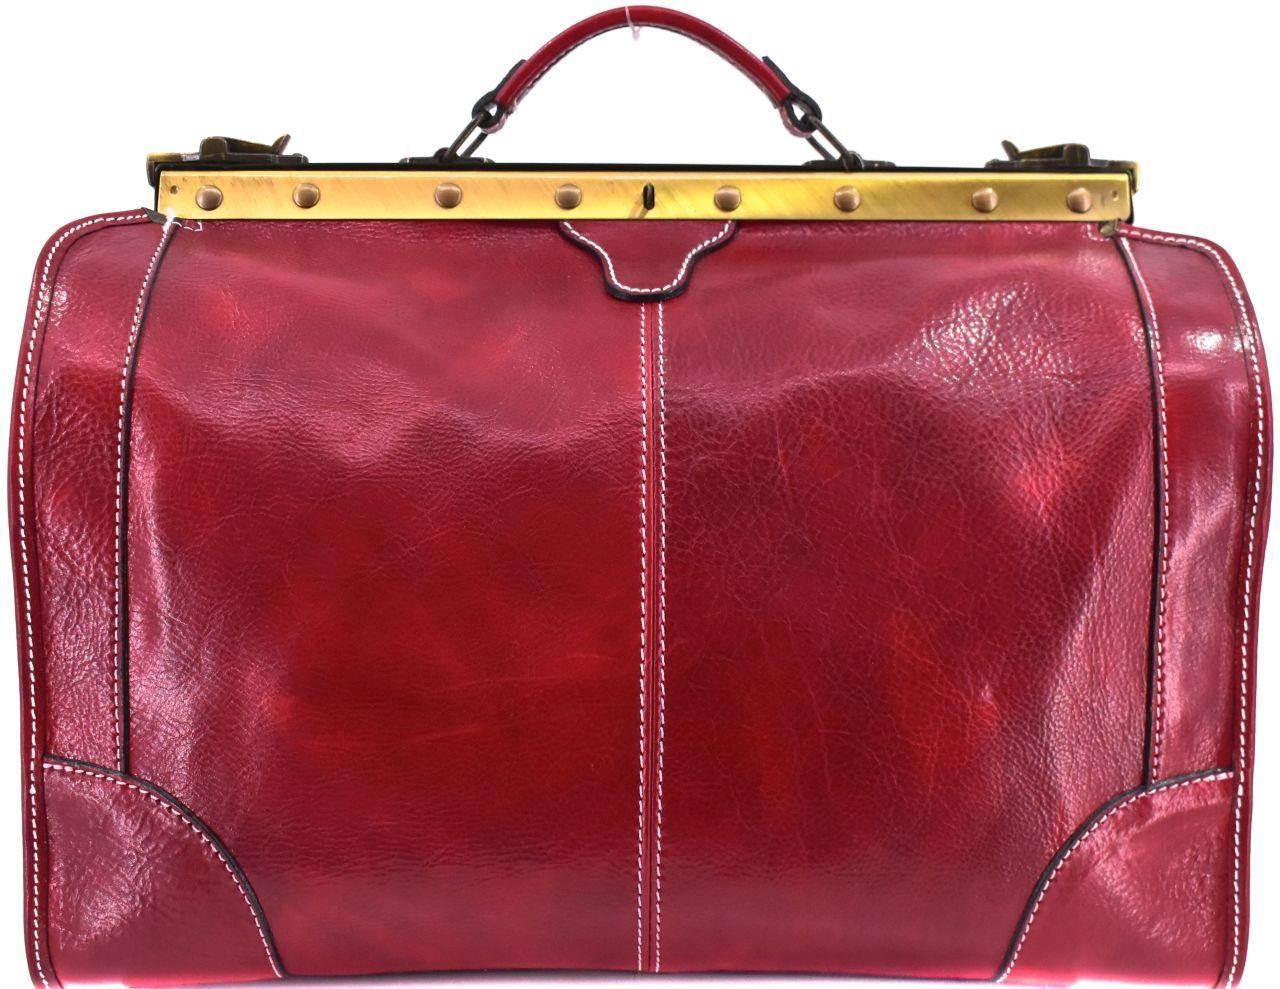 Kožená doktorská taška Arteddy - tmavě červená